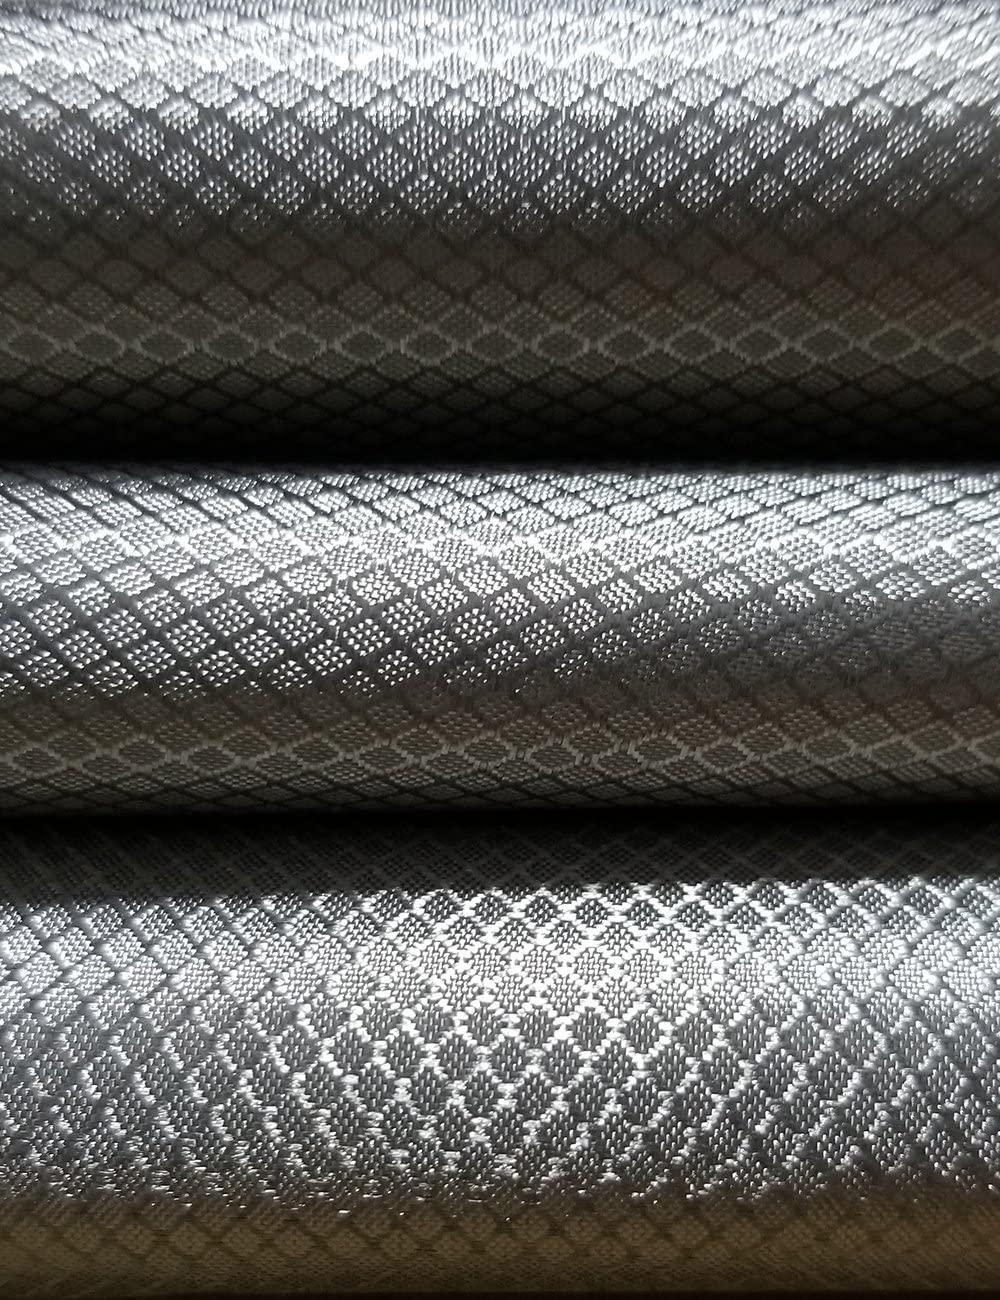 LVFEIER Radiation Protection/Conductive/RFID Shielding/EMF Blocking Fabric Blocking WiFi-Anti-Prevent Electronic Information Leakage (39.3742.52IN)